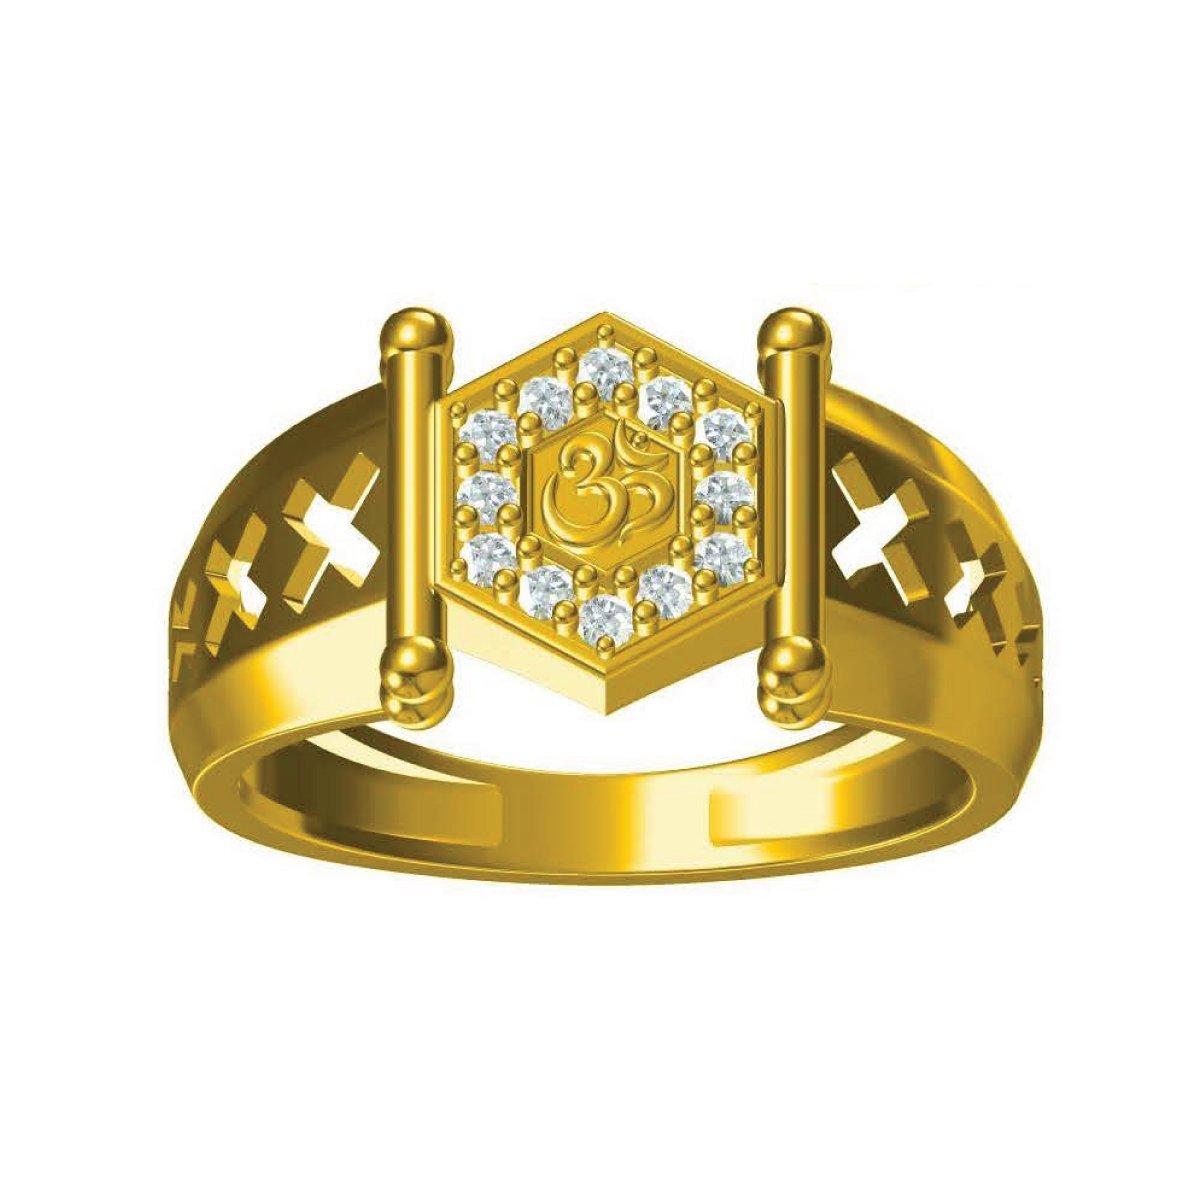 Hari Om Gold Ring